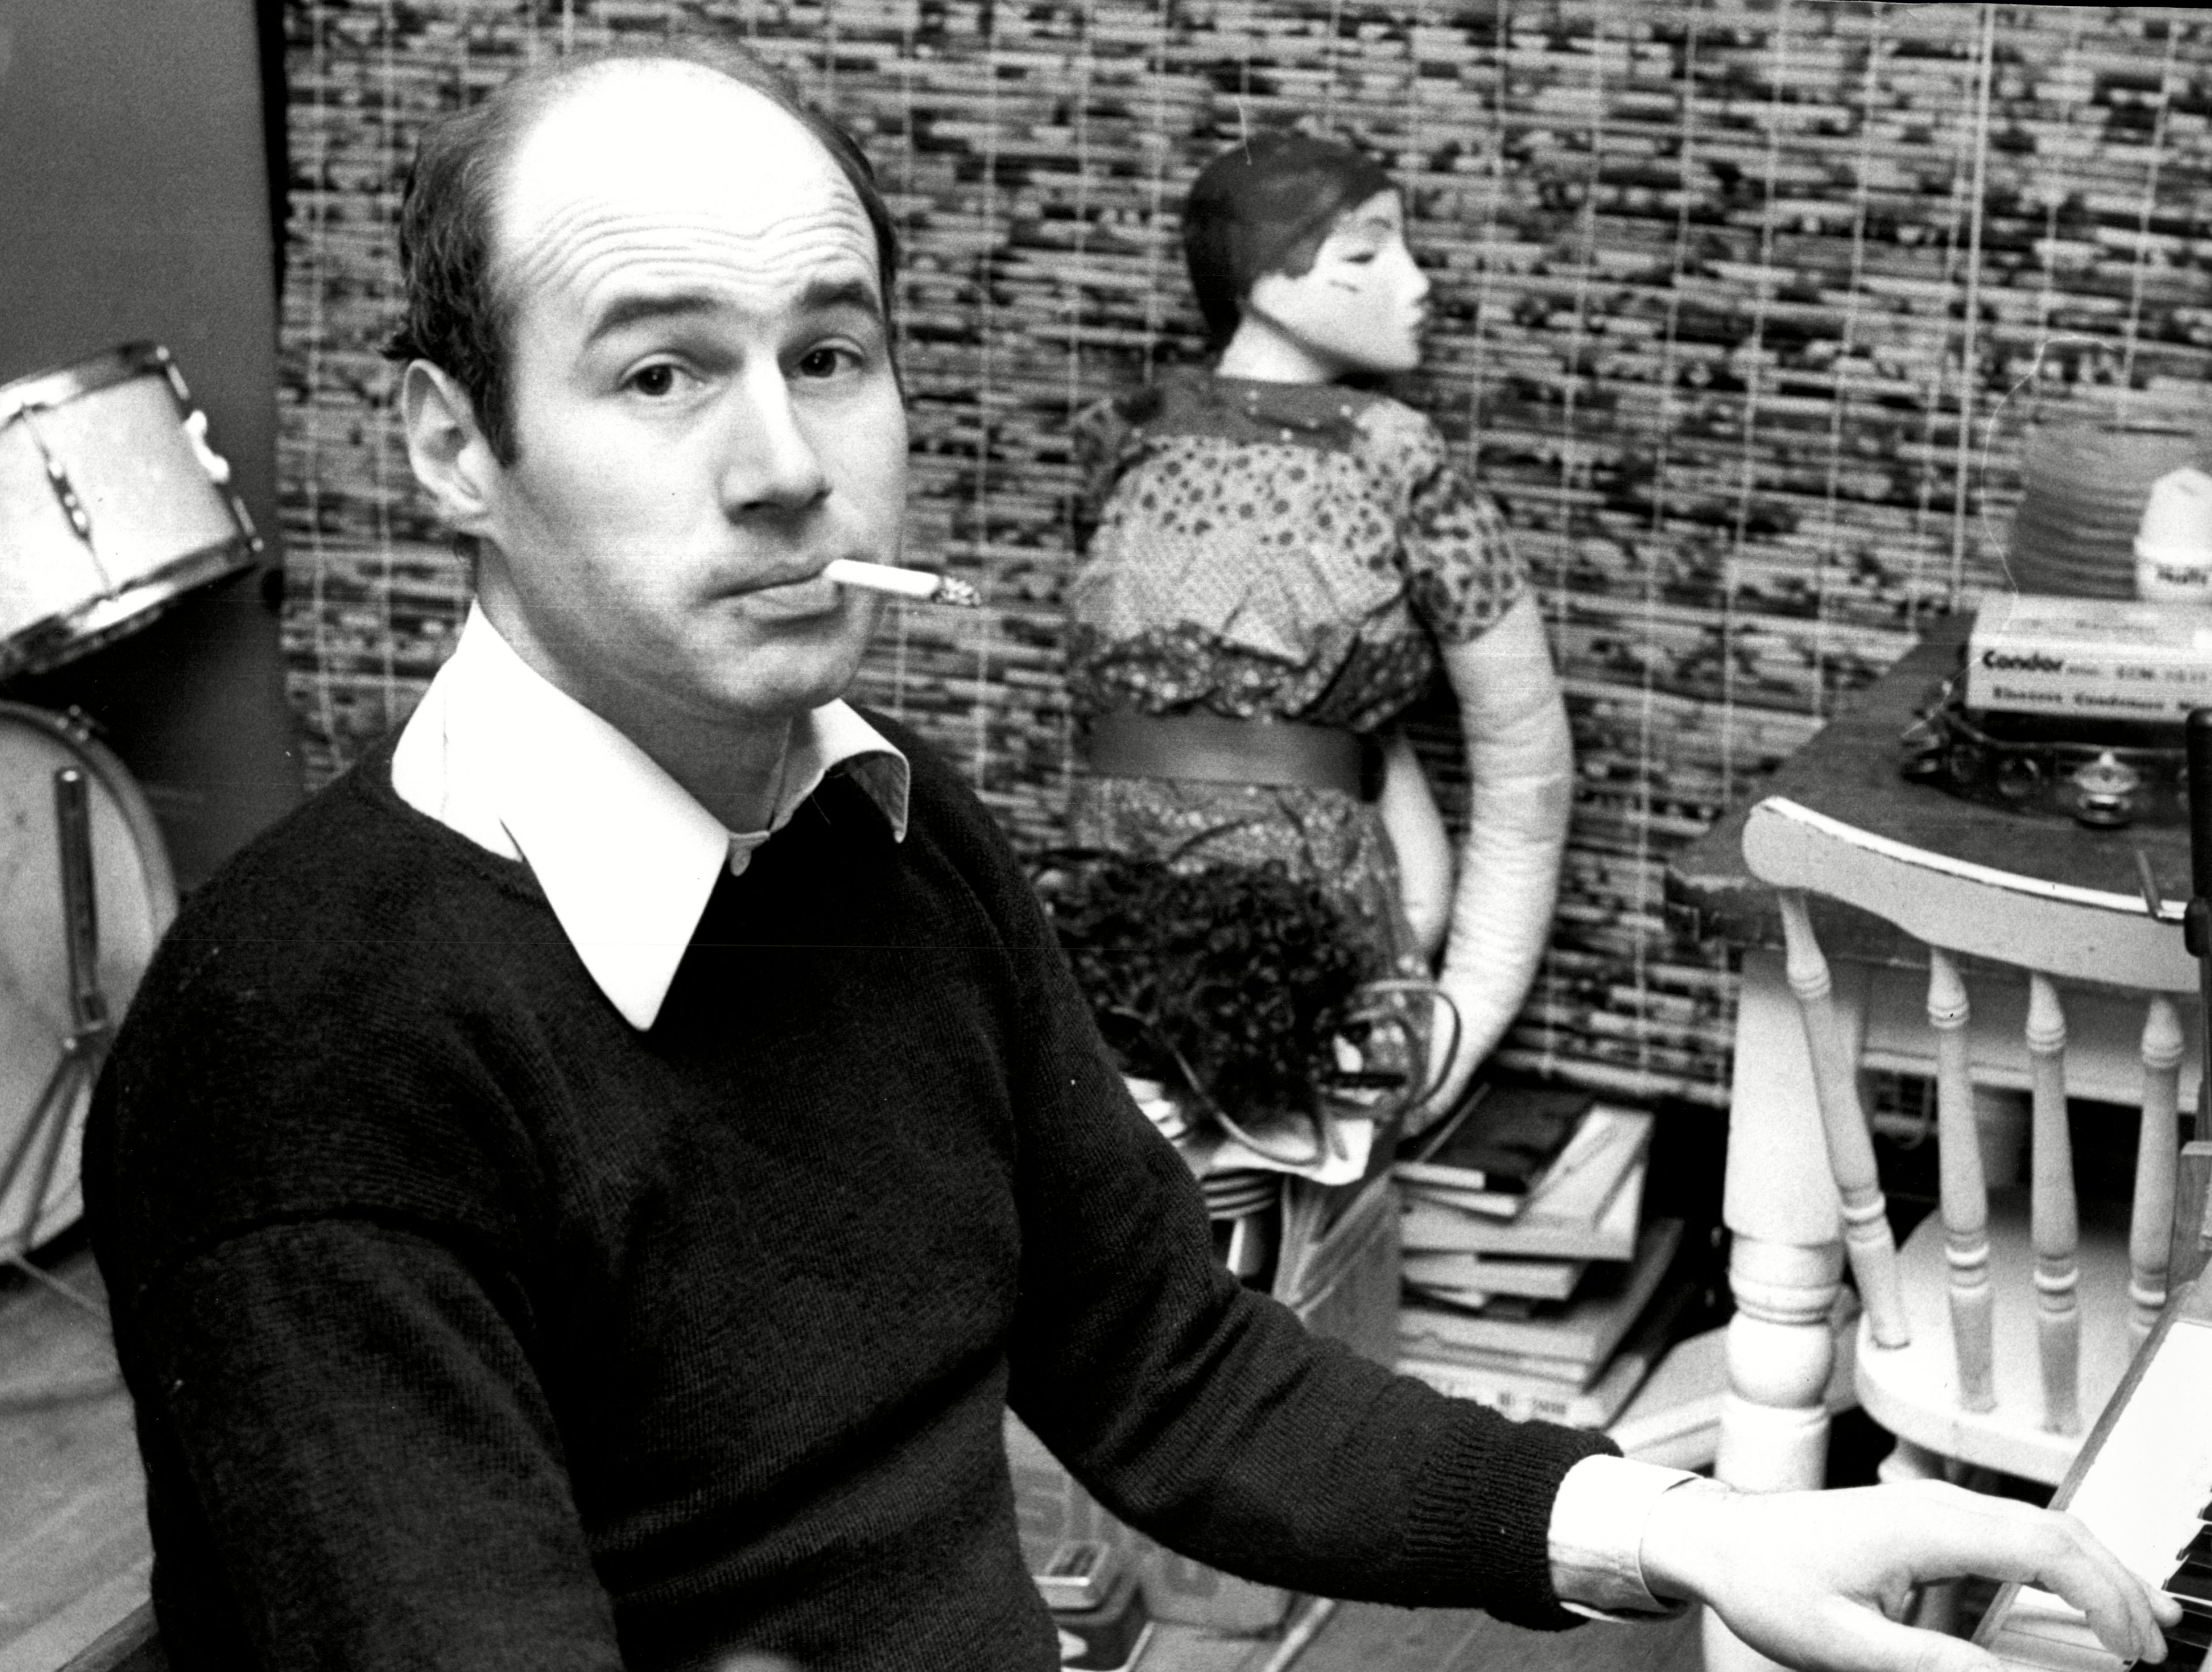 Neil Innes, 'Monty Python' Songwriter, Rutles Co-Founder, Dead at 75 - EpicNews